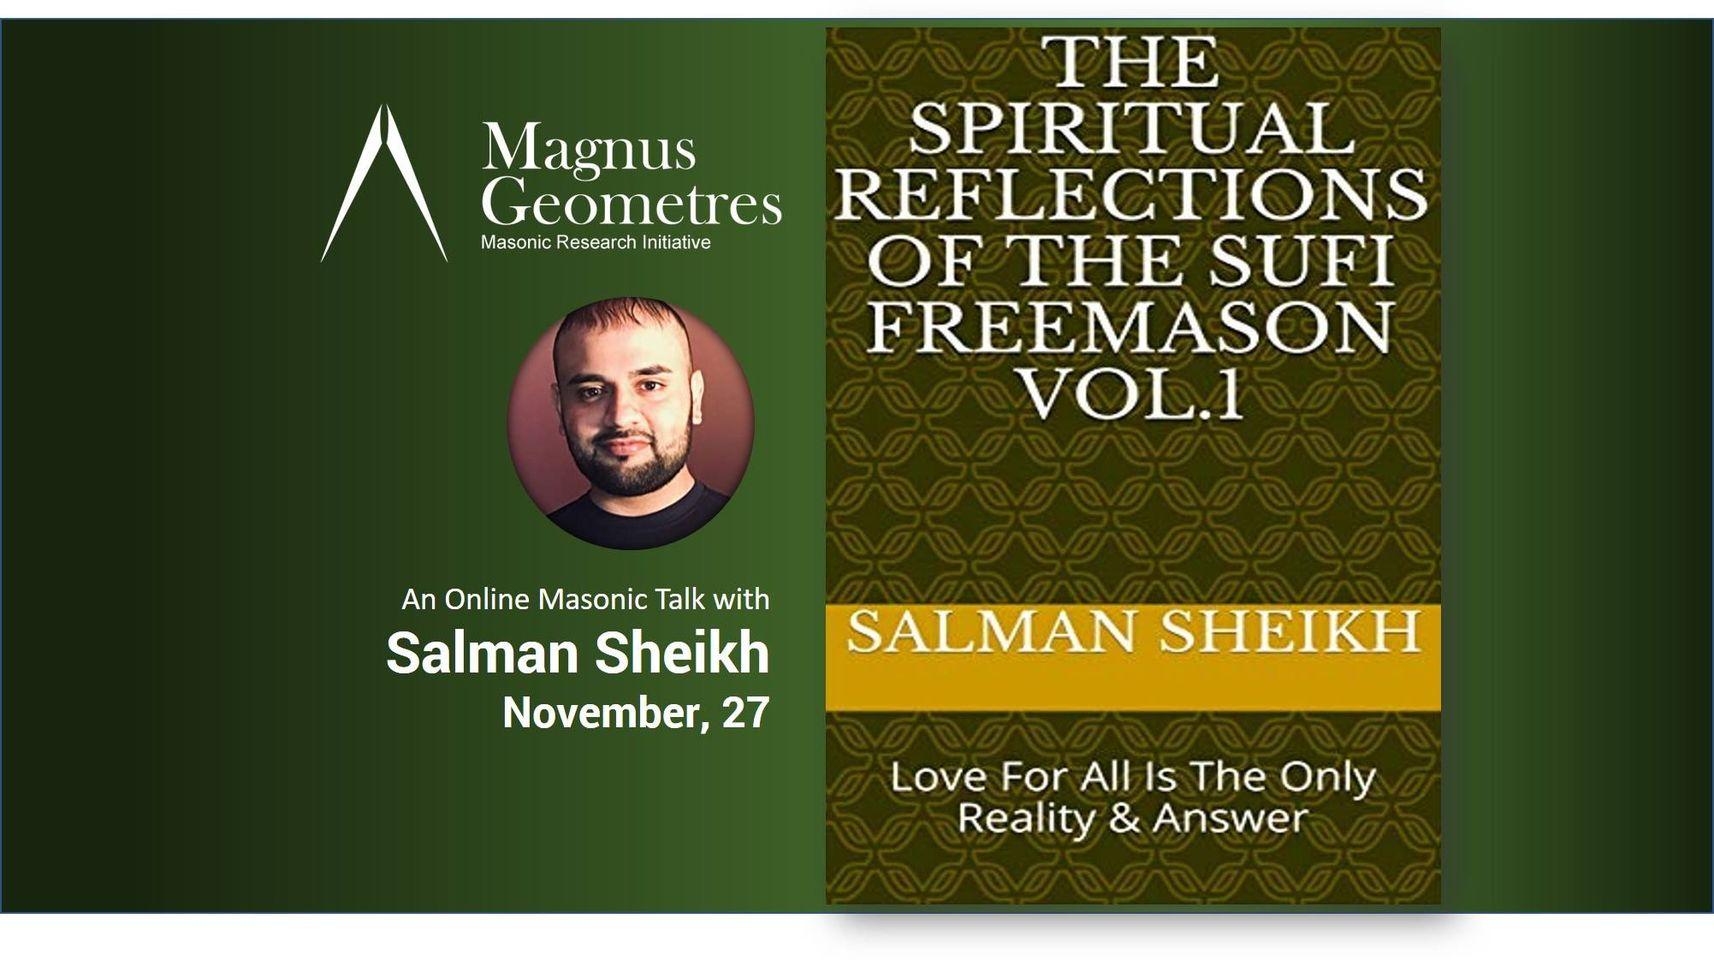 Spiritual reflection of sufi freemason The Spiritual Reflections of The Sufi Freemason By Salman S. Sheikh